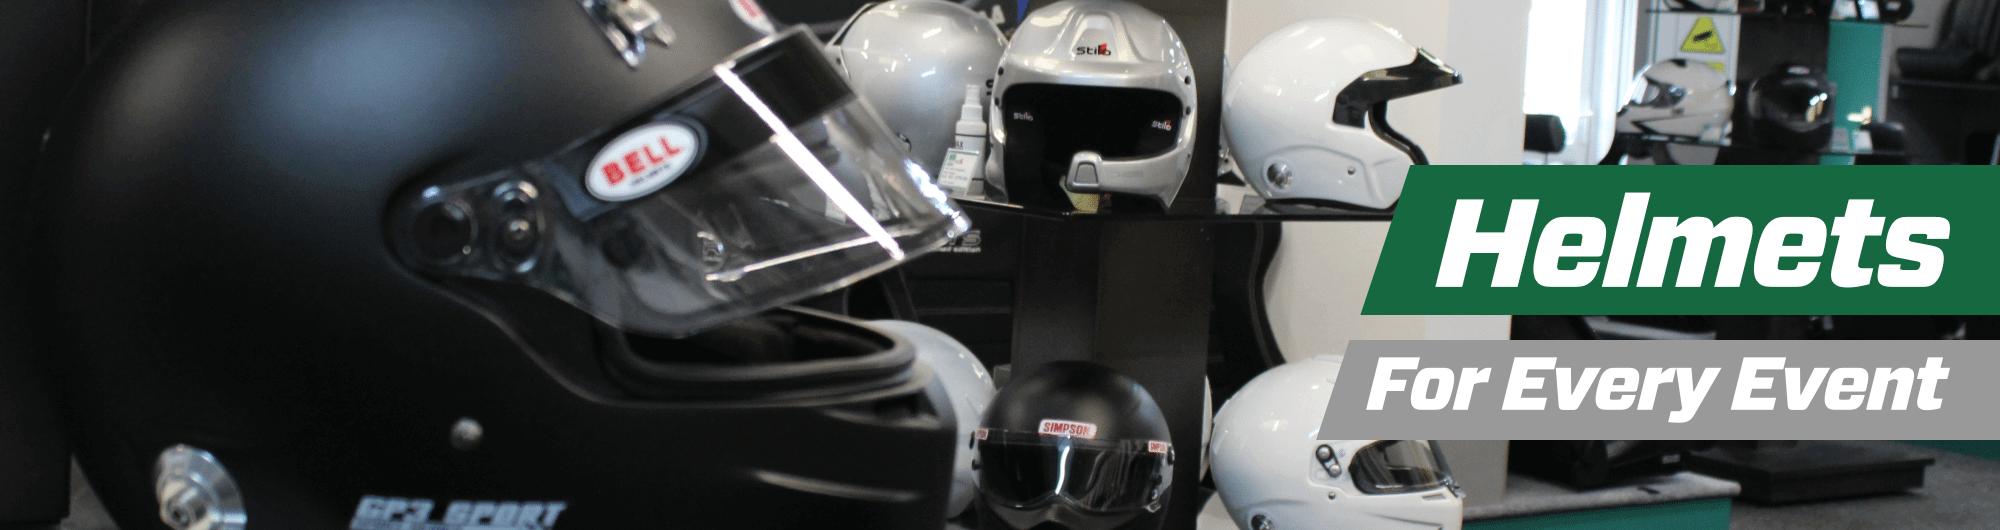 Helmets – For Every Event – www.gsmotorsport.co.uk Hero Image – October 2017